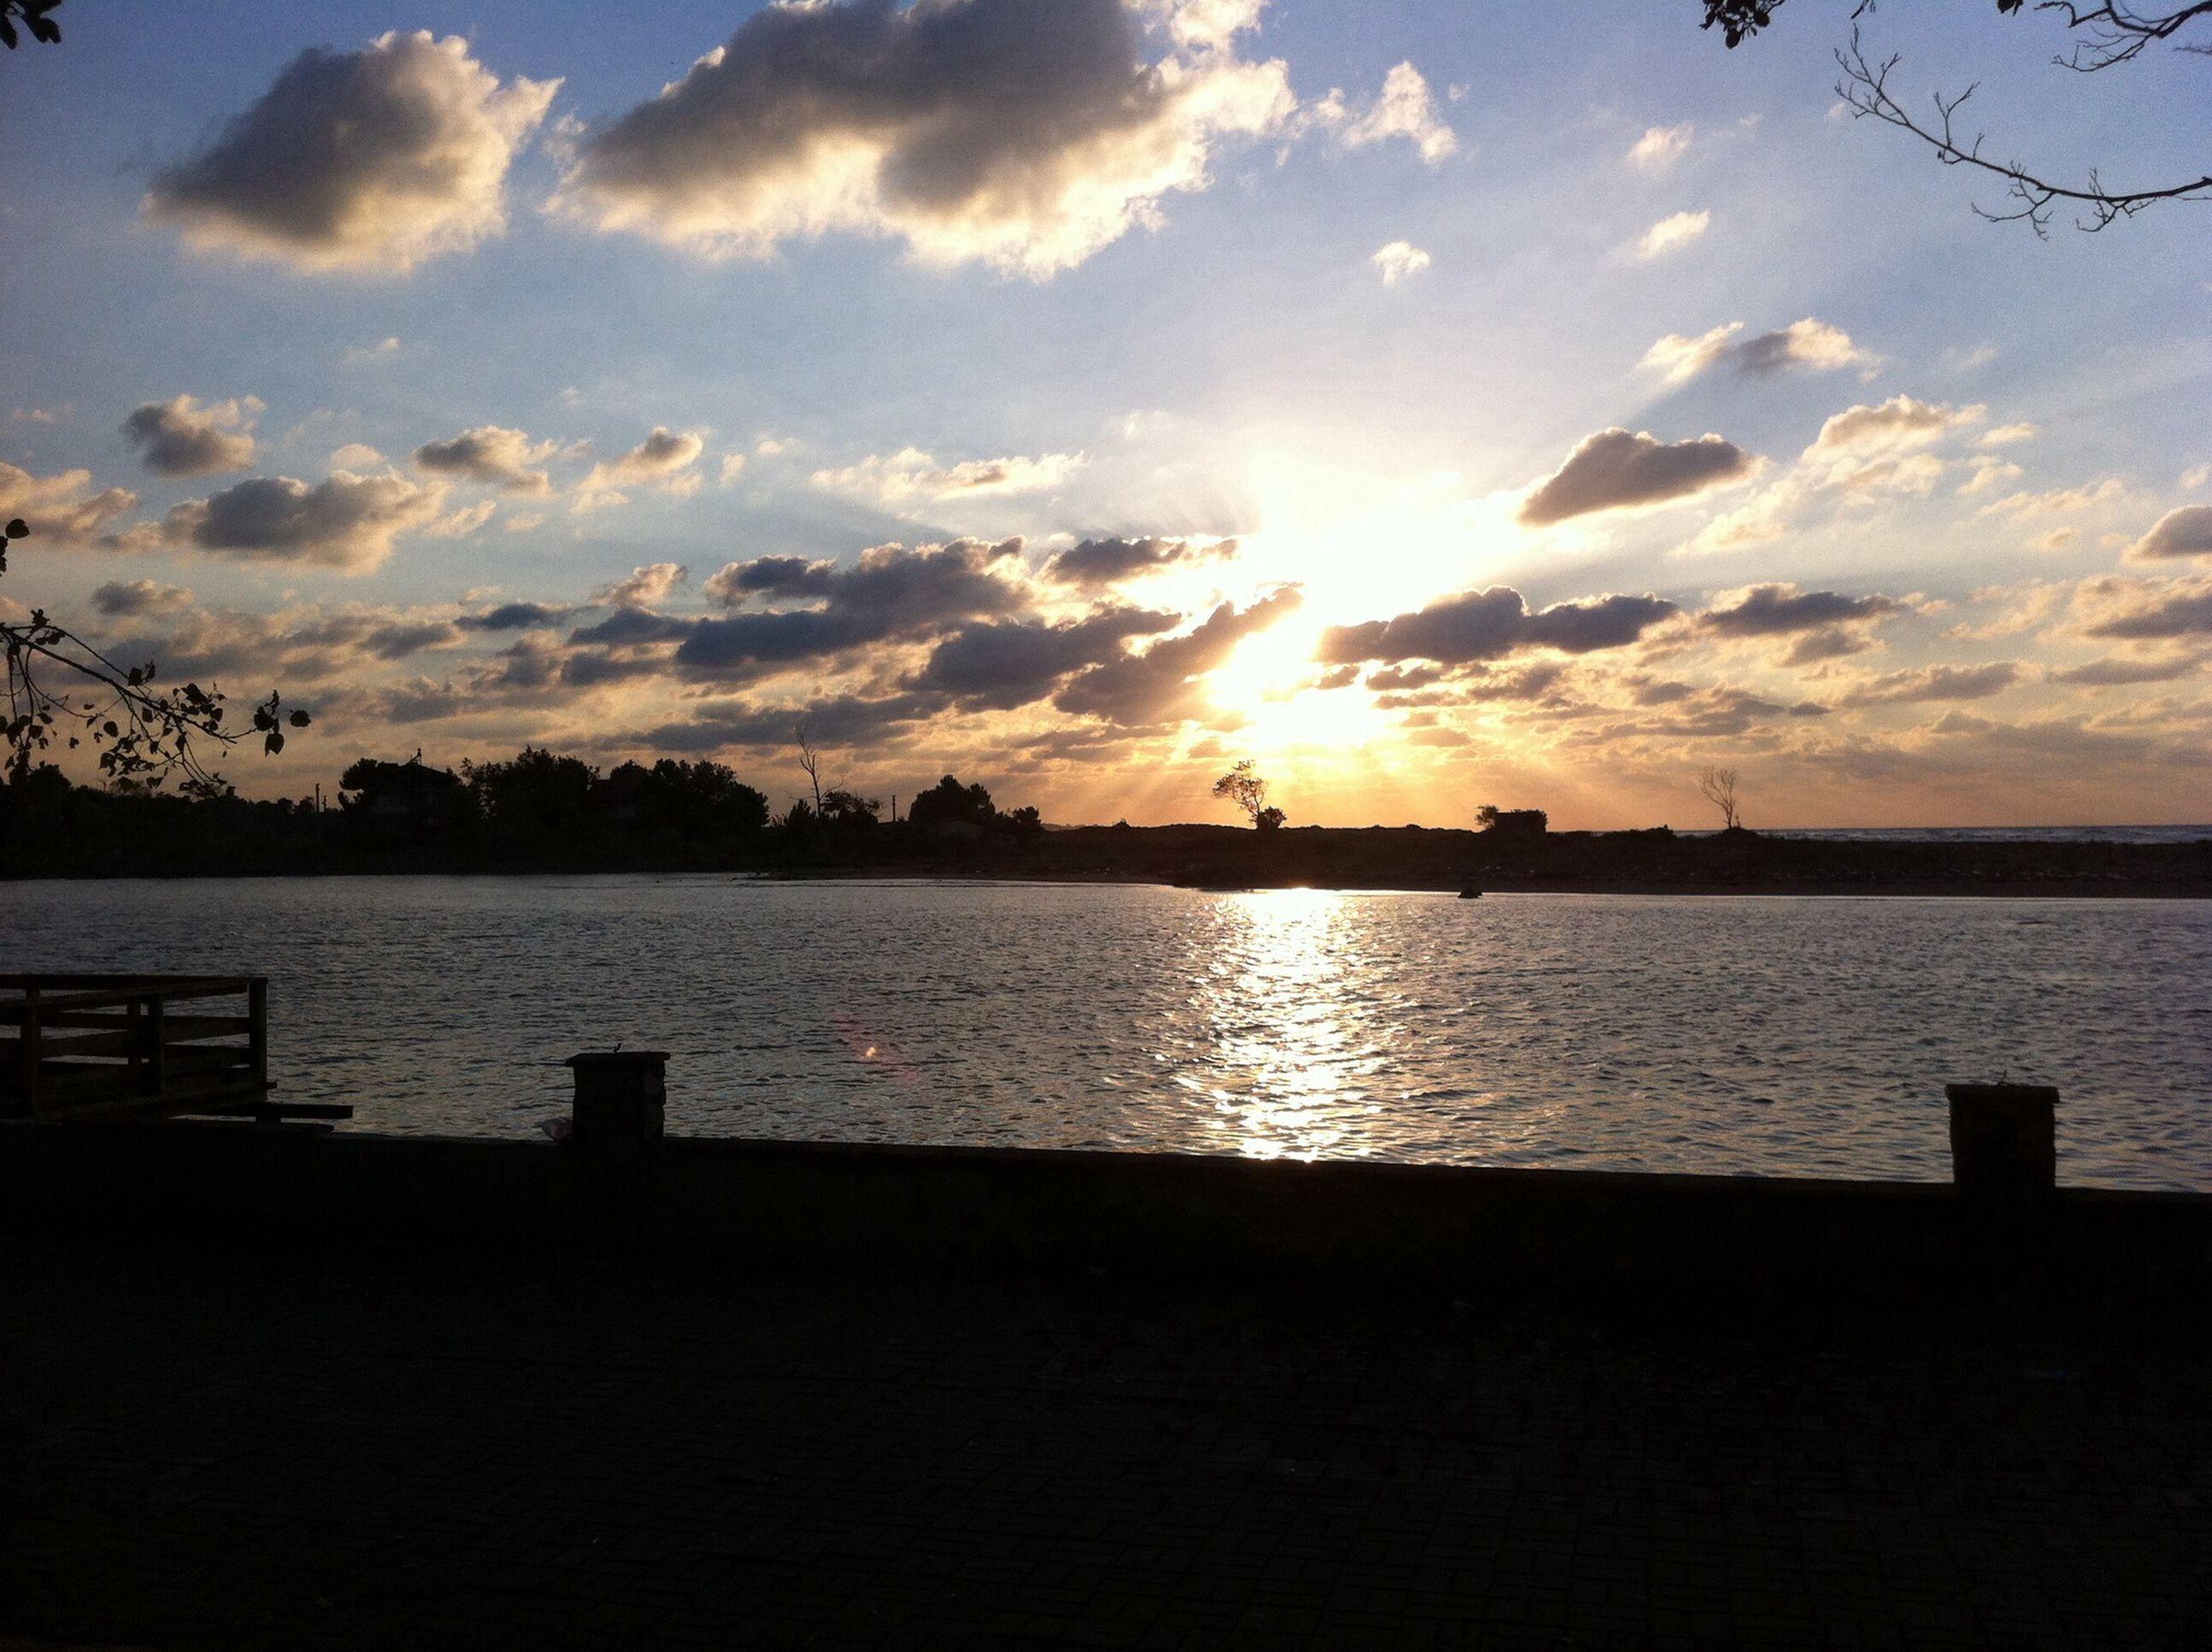 sunset, water, sky, sun, tranquil scene, scenics, tranquility, beauty in nature, cloud - sky, silhouette, sea, reflection, nature, sunlight, lake, idyllic, cloud, orange color, pier, sunbeam